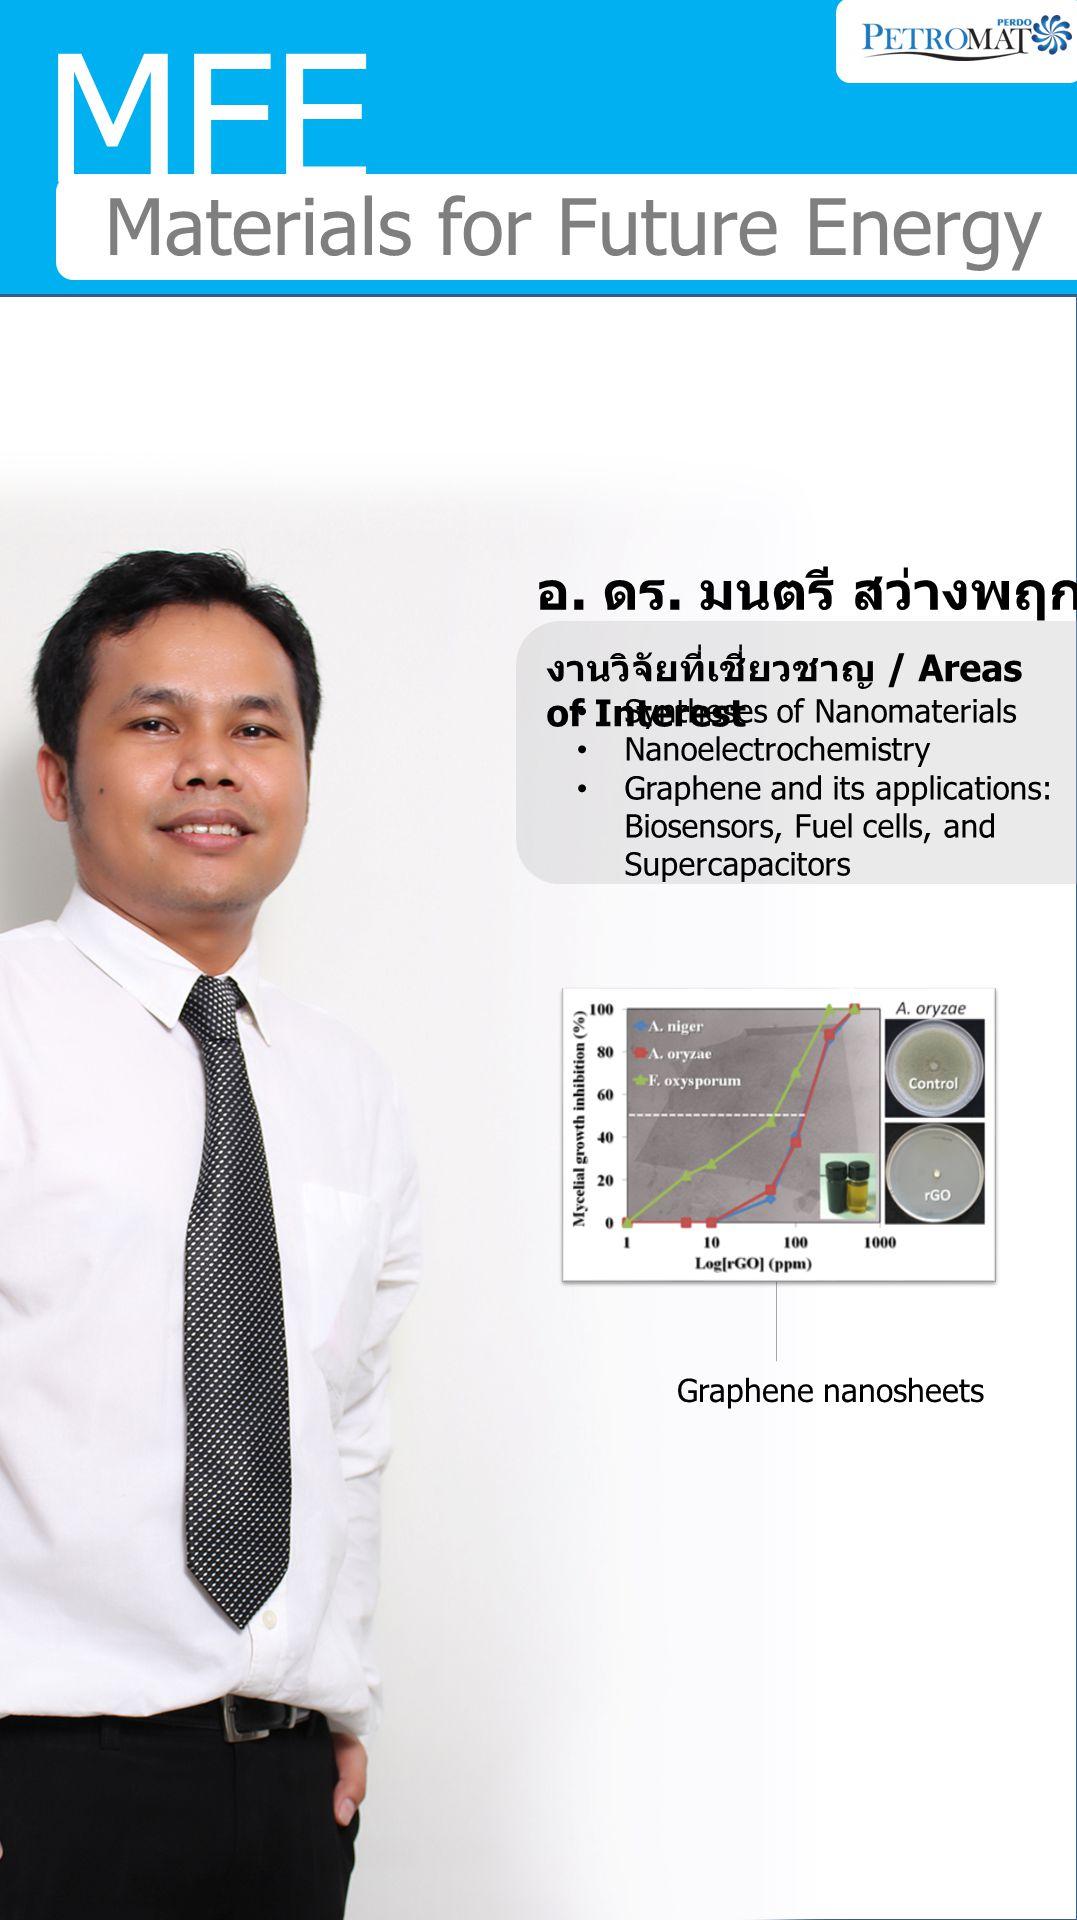 MFE Materials for Future Energy อ. ดร. มนตรี สว่างพฤกษ์